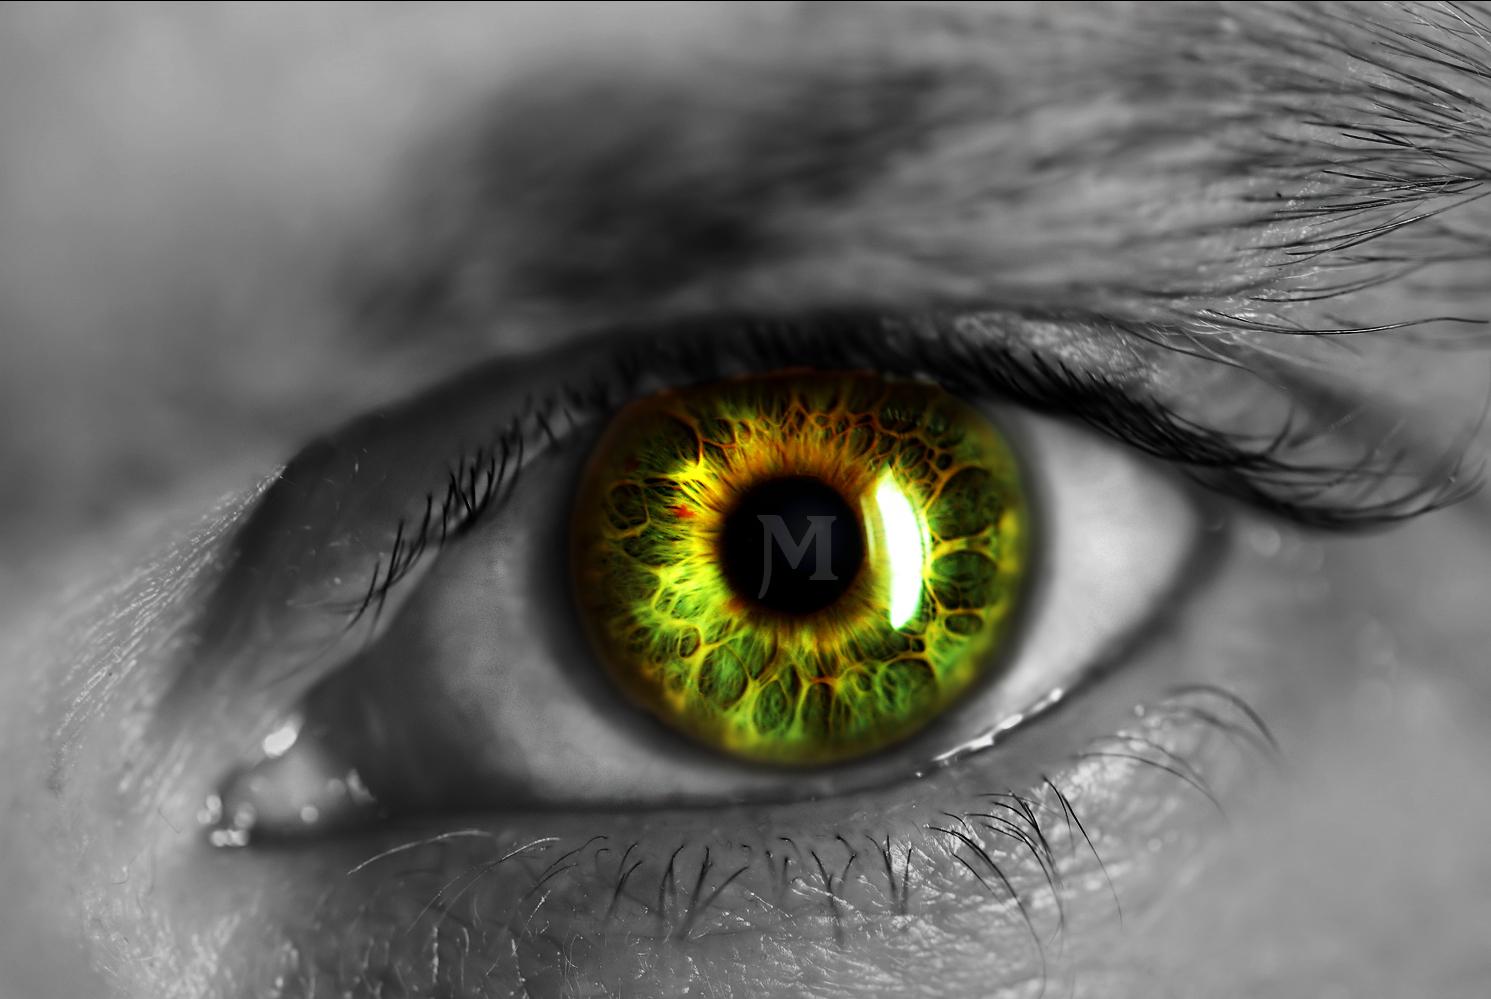 Green Man Eye Computer Wallpapers Desktop Backgrounds 1491x999 ID 1491x999